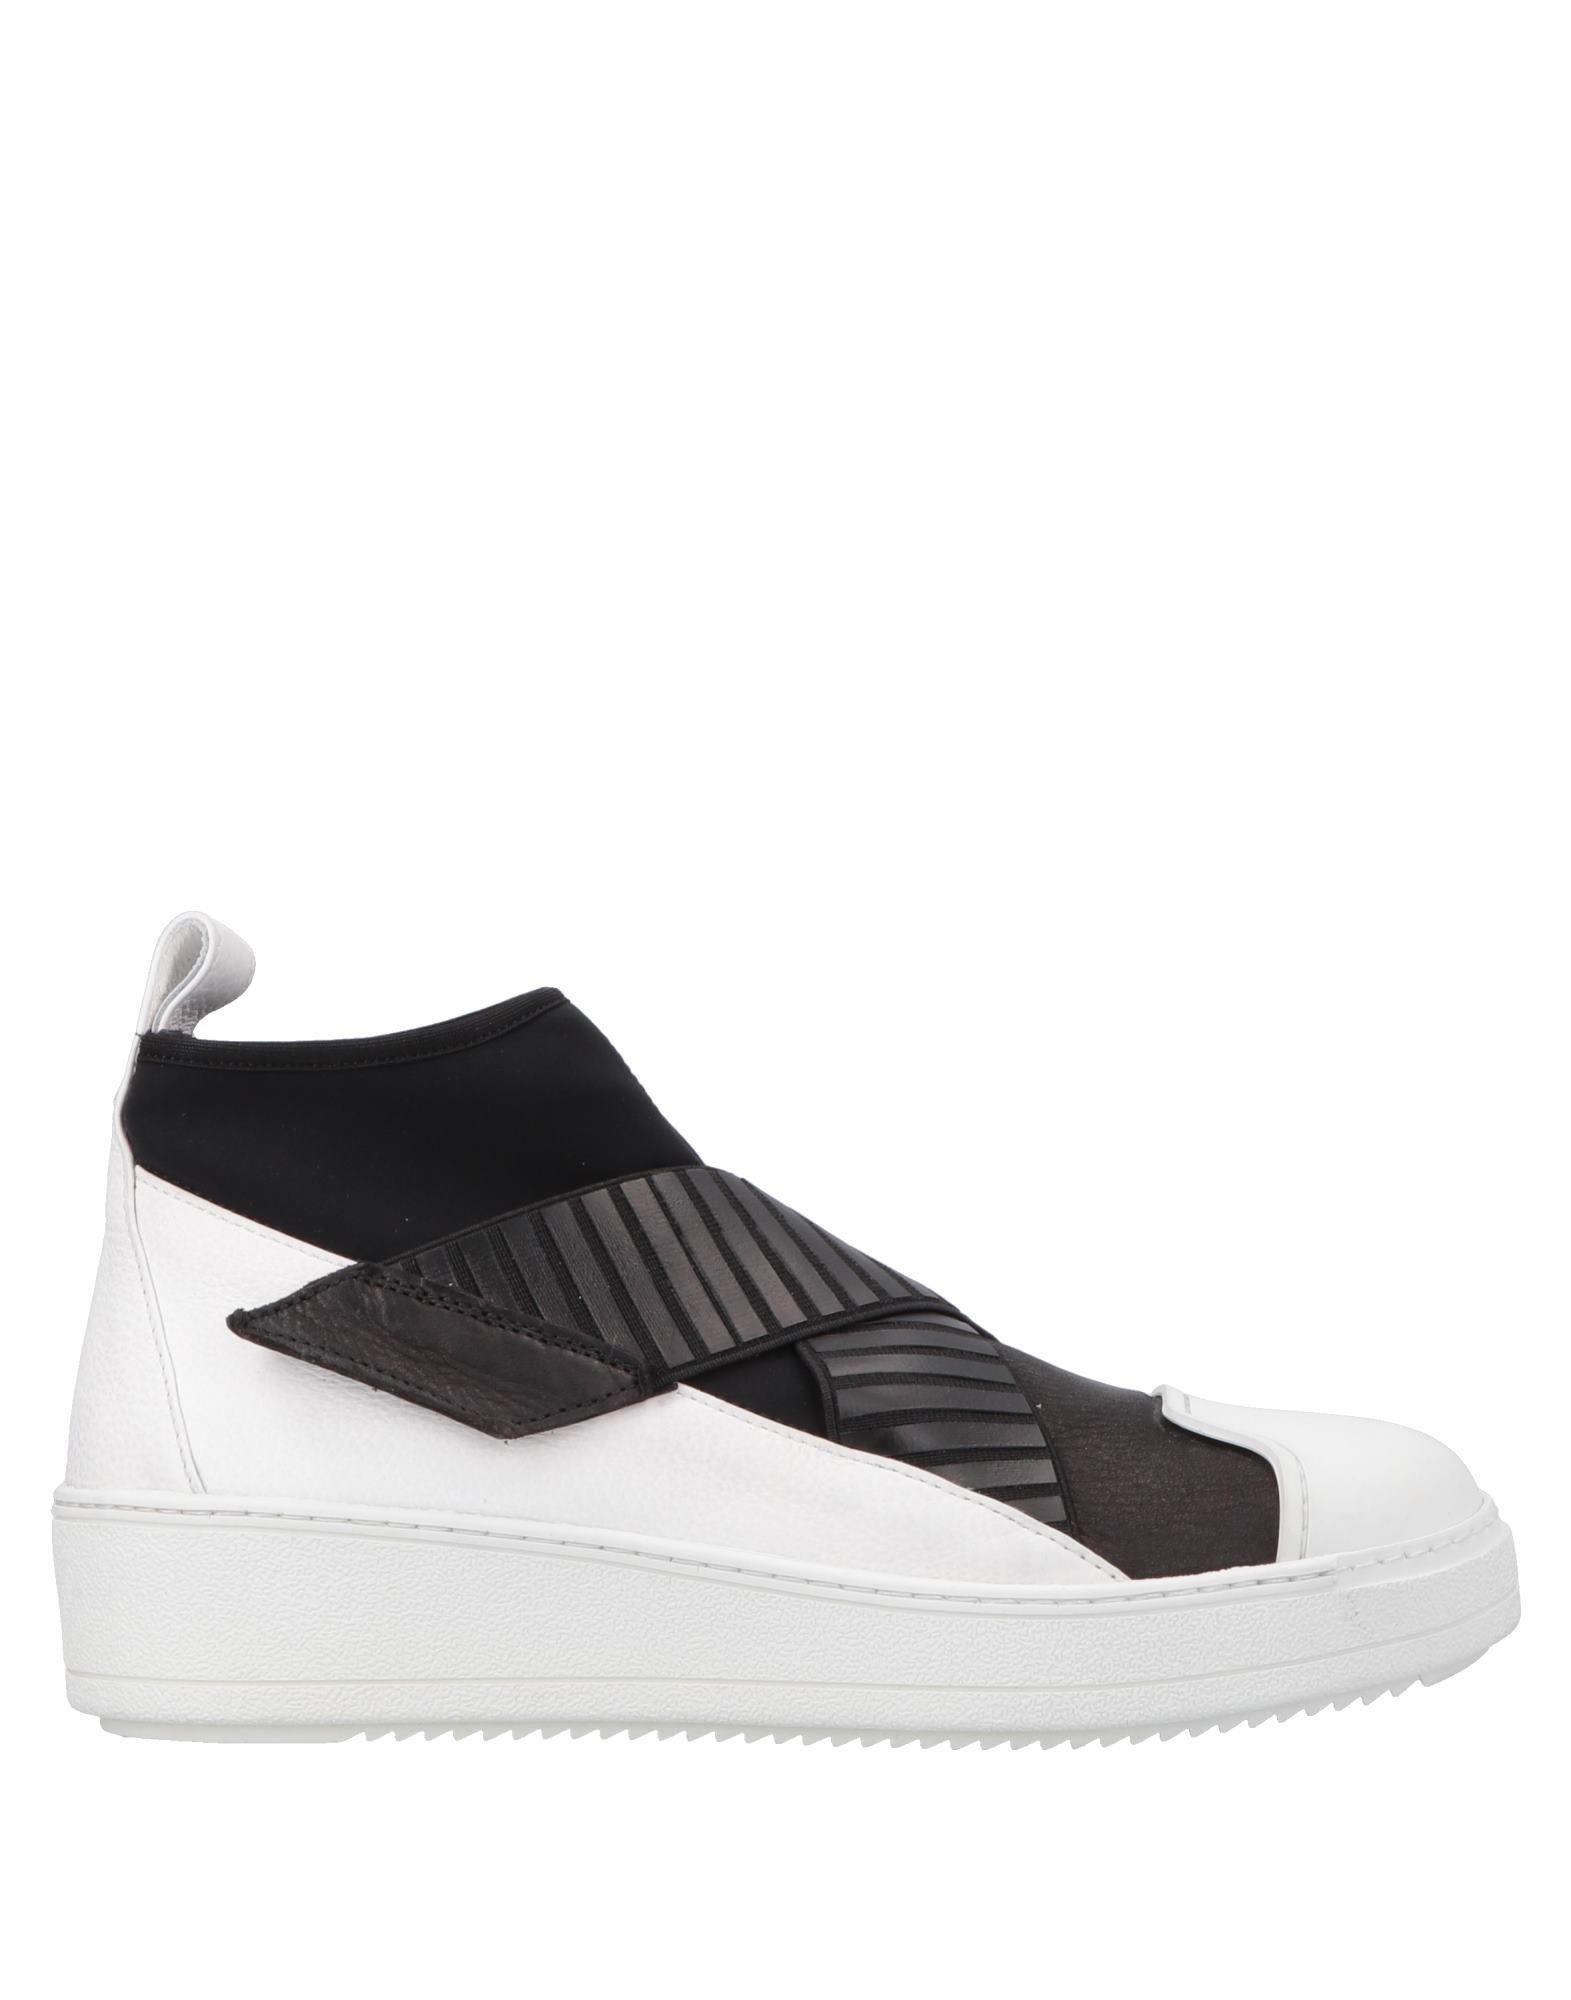 43d8aa8df9519 Lyst - Fru.It High-tops   Sneakers in Black